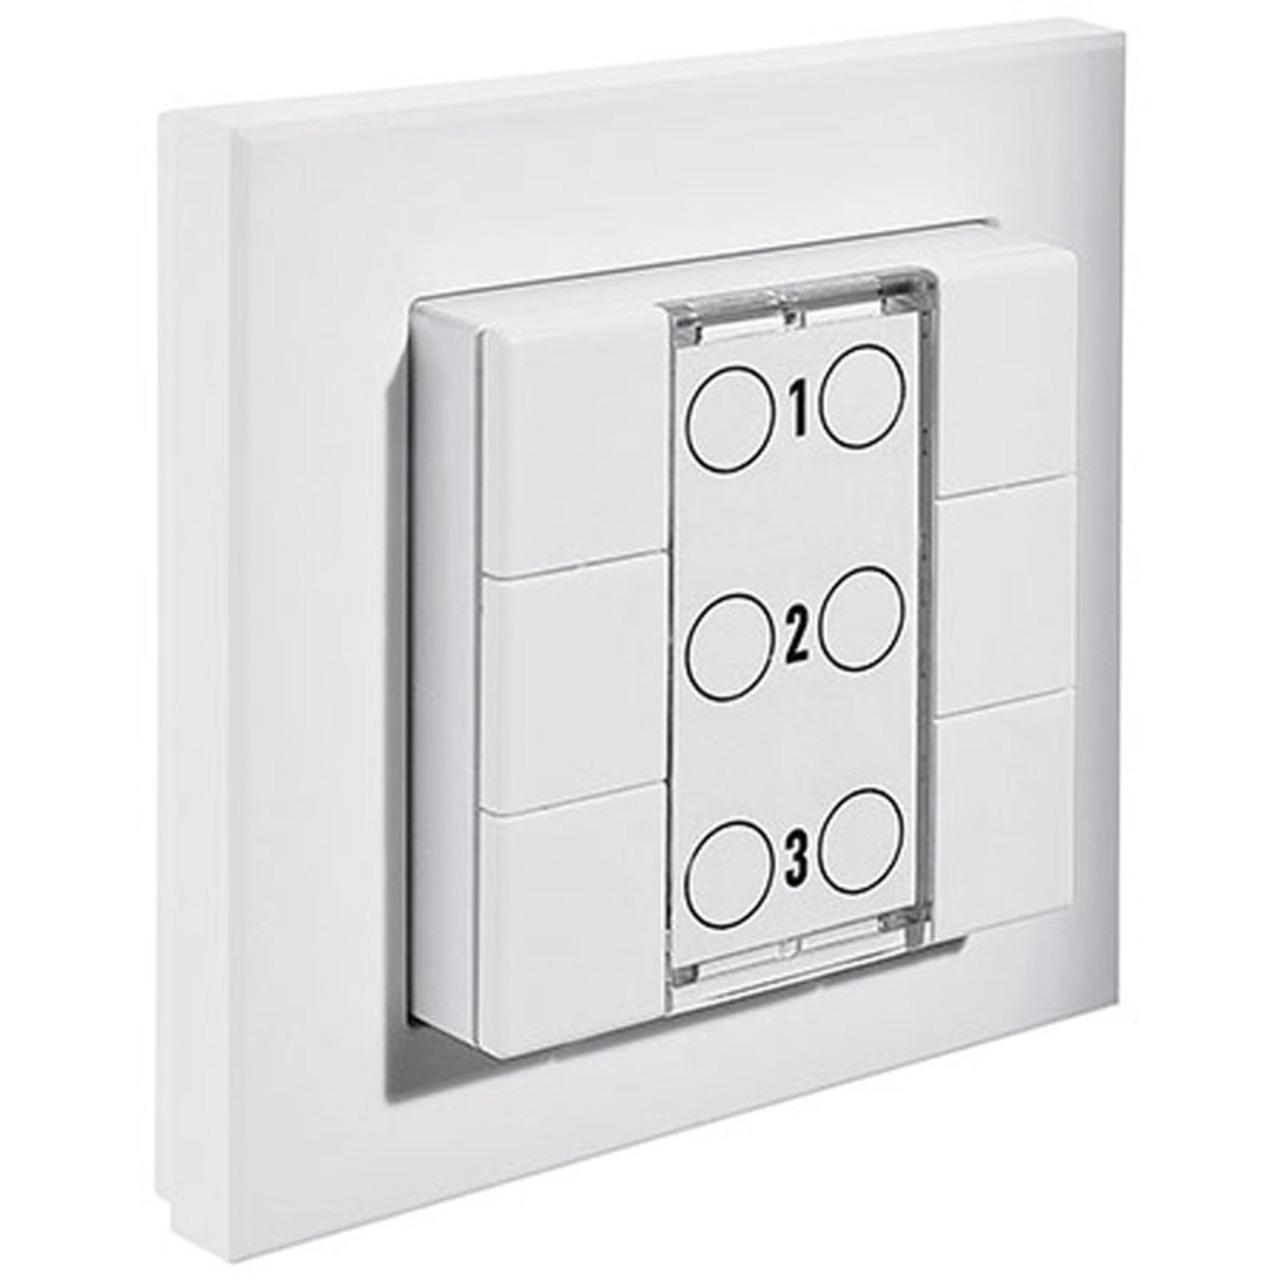 Homematic Funk-Wandsender 6fach HM-PB-6-WM55 für Smart Home - Hausautomation